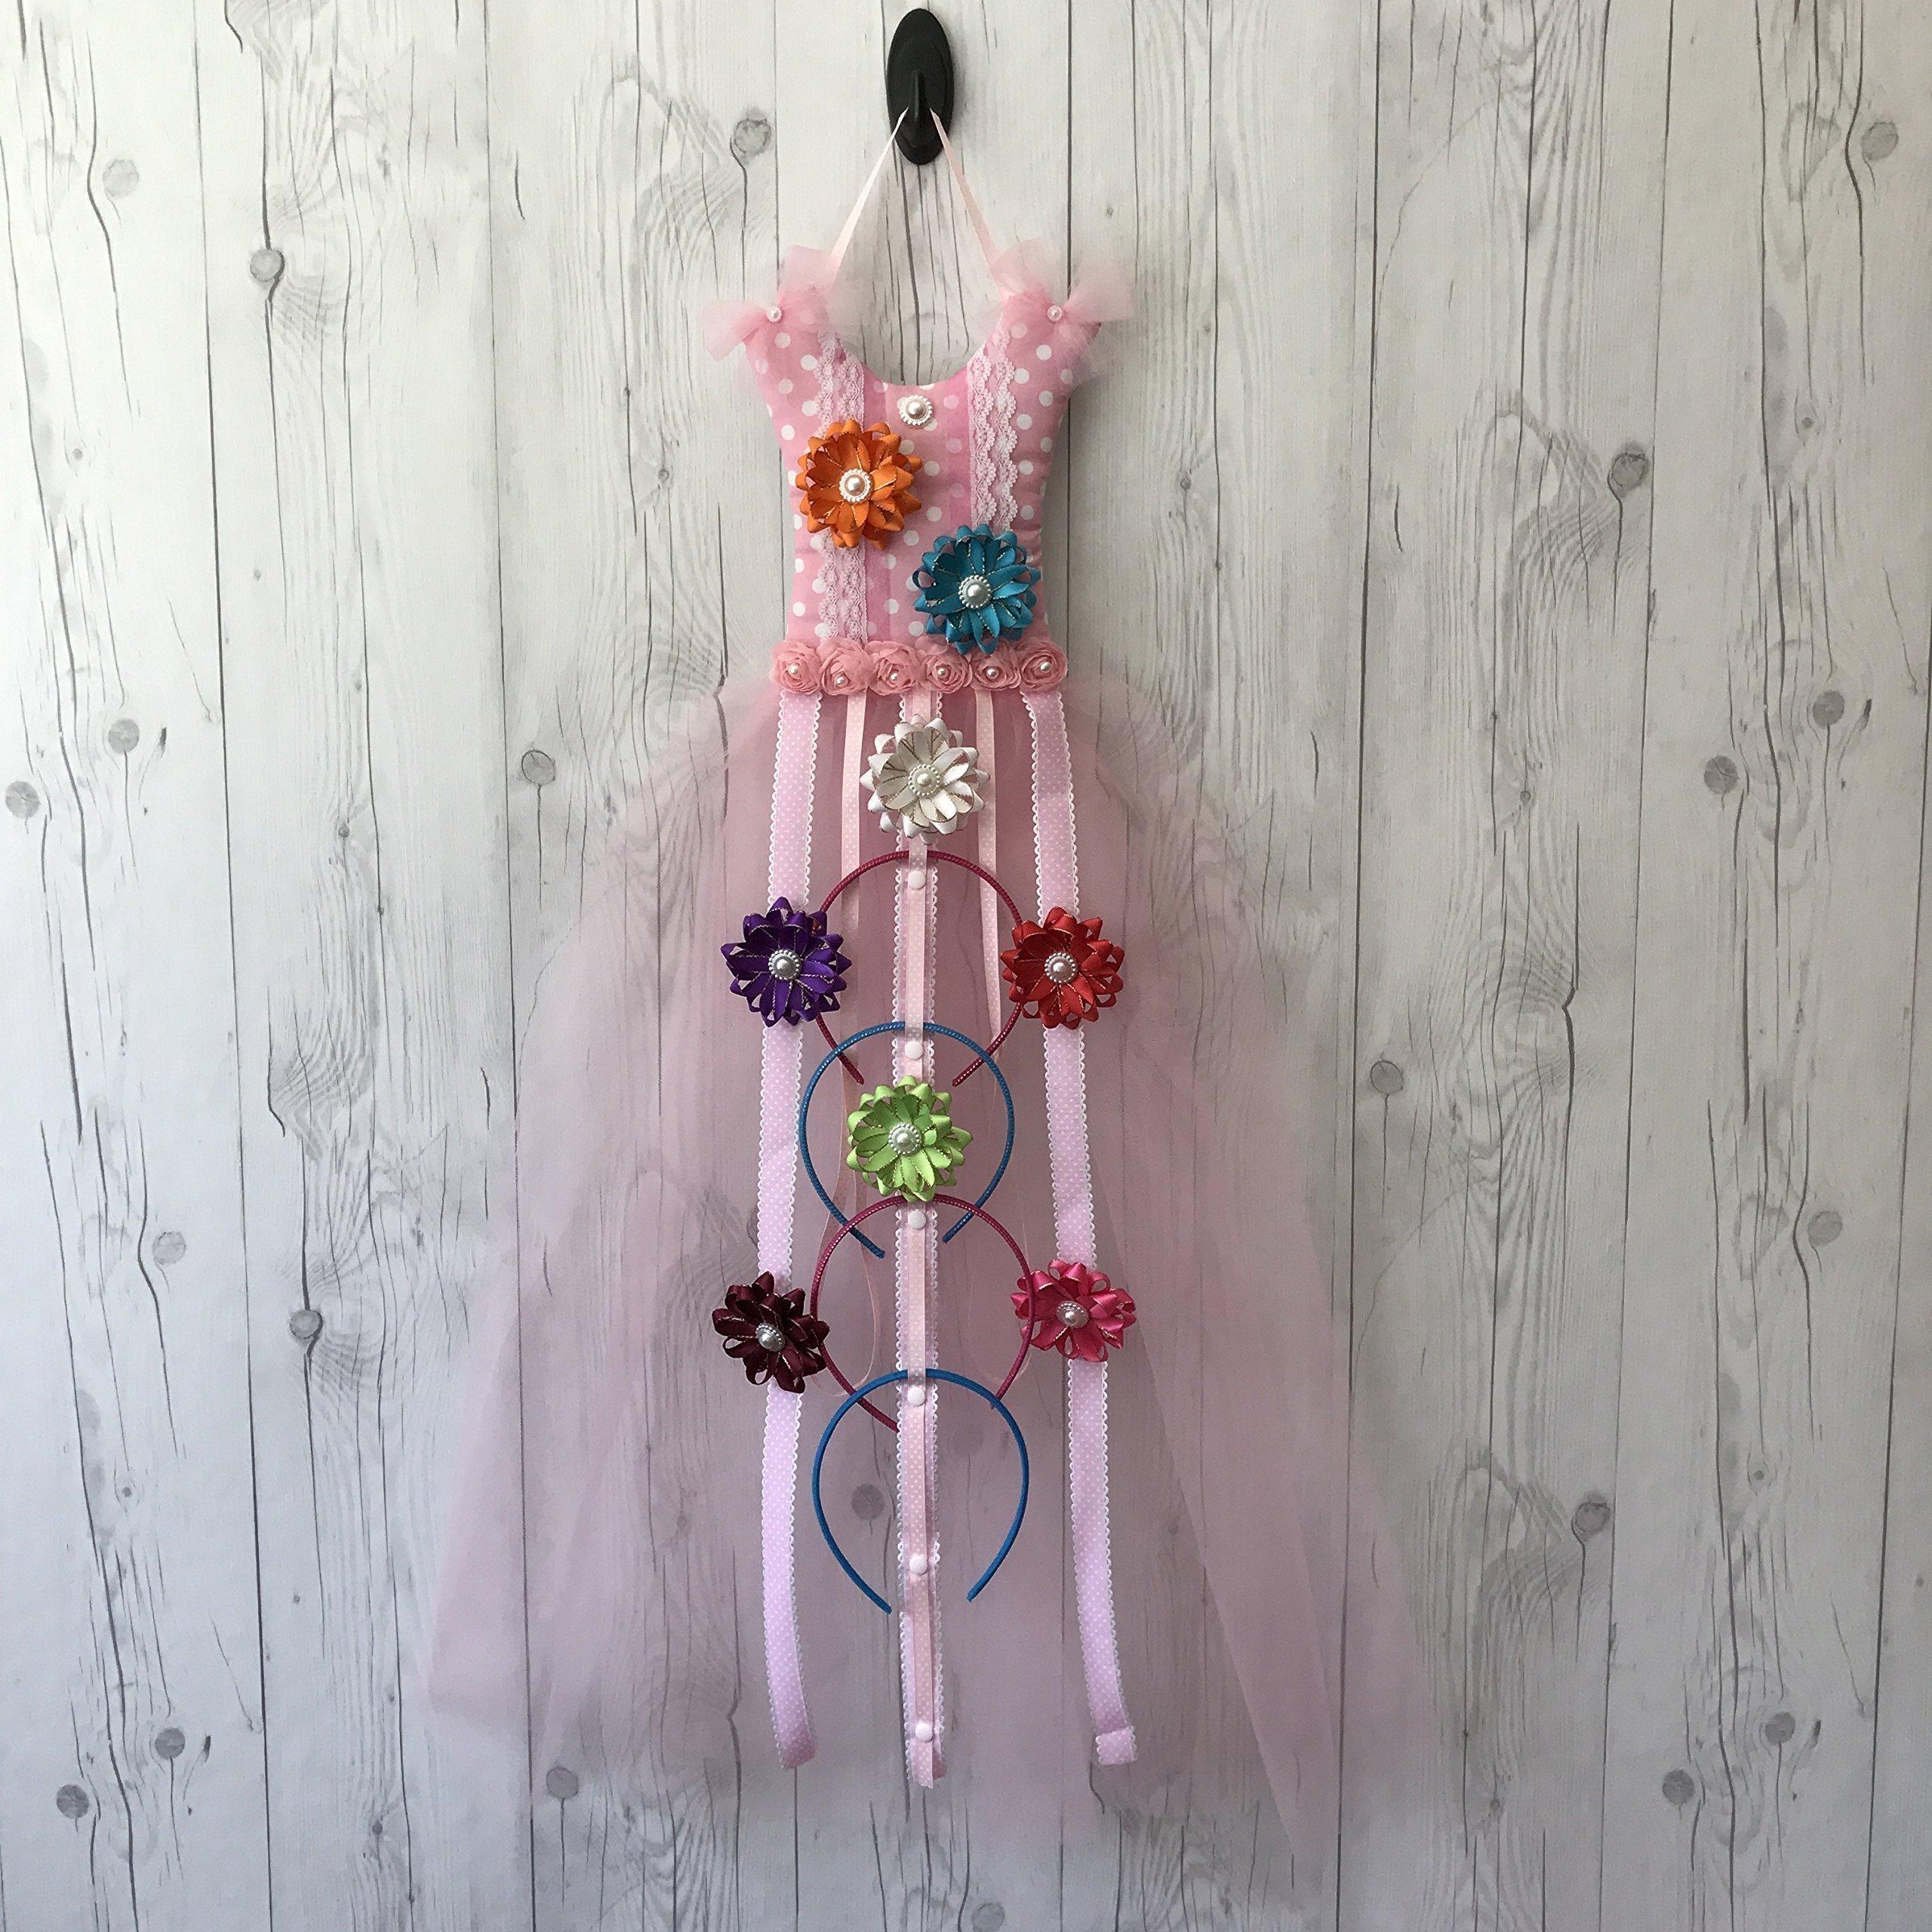 Bead&Cord Pink Polka Dots Tutu Dress Hair Bow Holder Organizer: Hair Accessories Holder for Hair Bows, Headbands, Hair Clips [Tutu Pink Polka Dots]